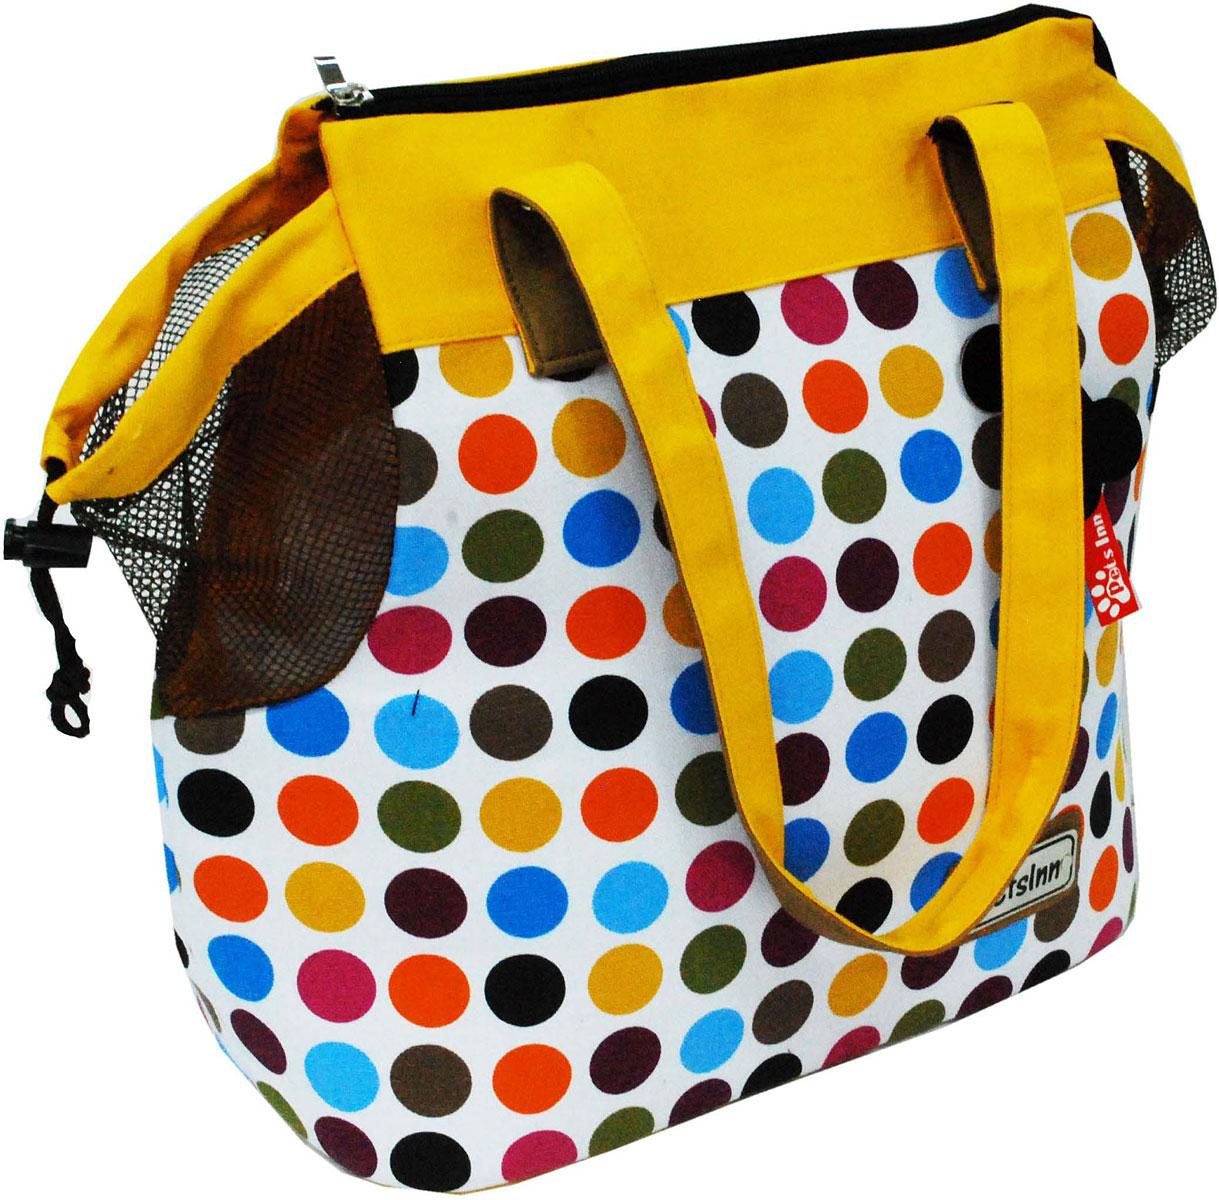 Сумка-переноска для животных Pets Inn, цвет: желтый, разноцветные кружочки, 34 х 16 х 36 см сумка переноска для животных теремок цвет голубой синий белый 44 х 19 х 20 см